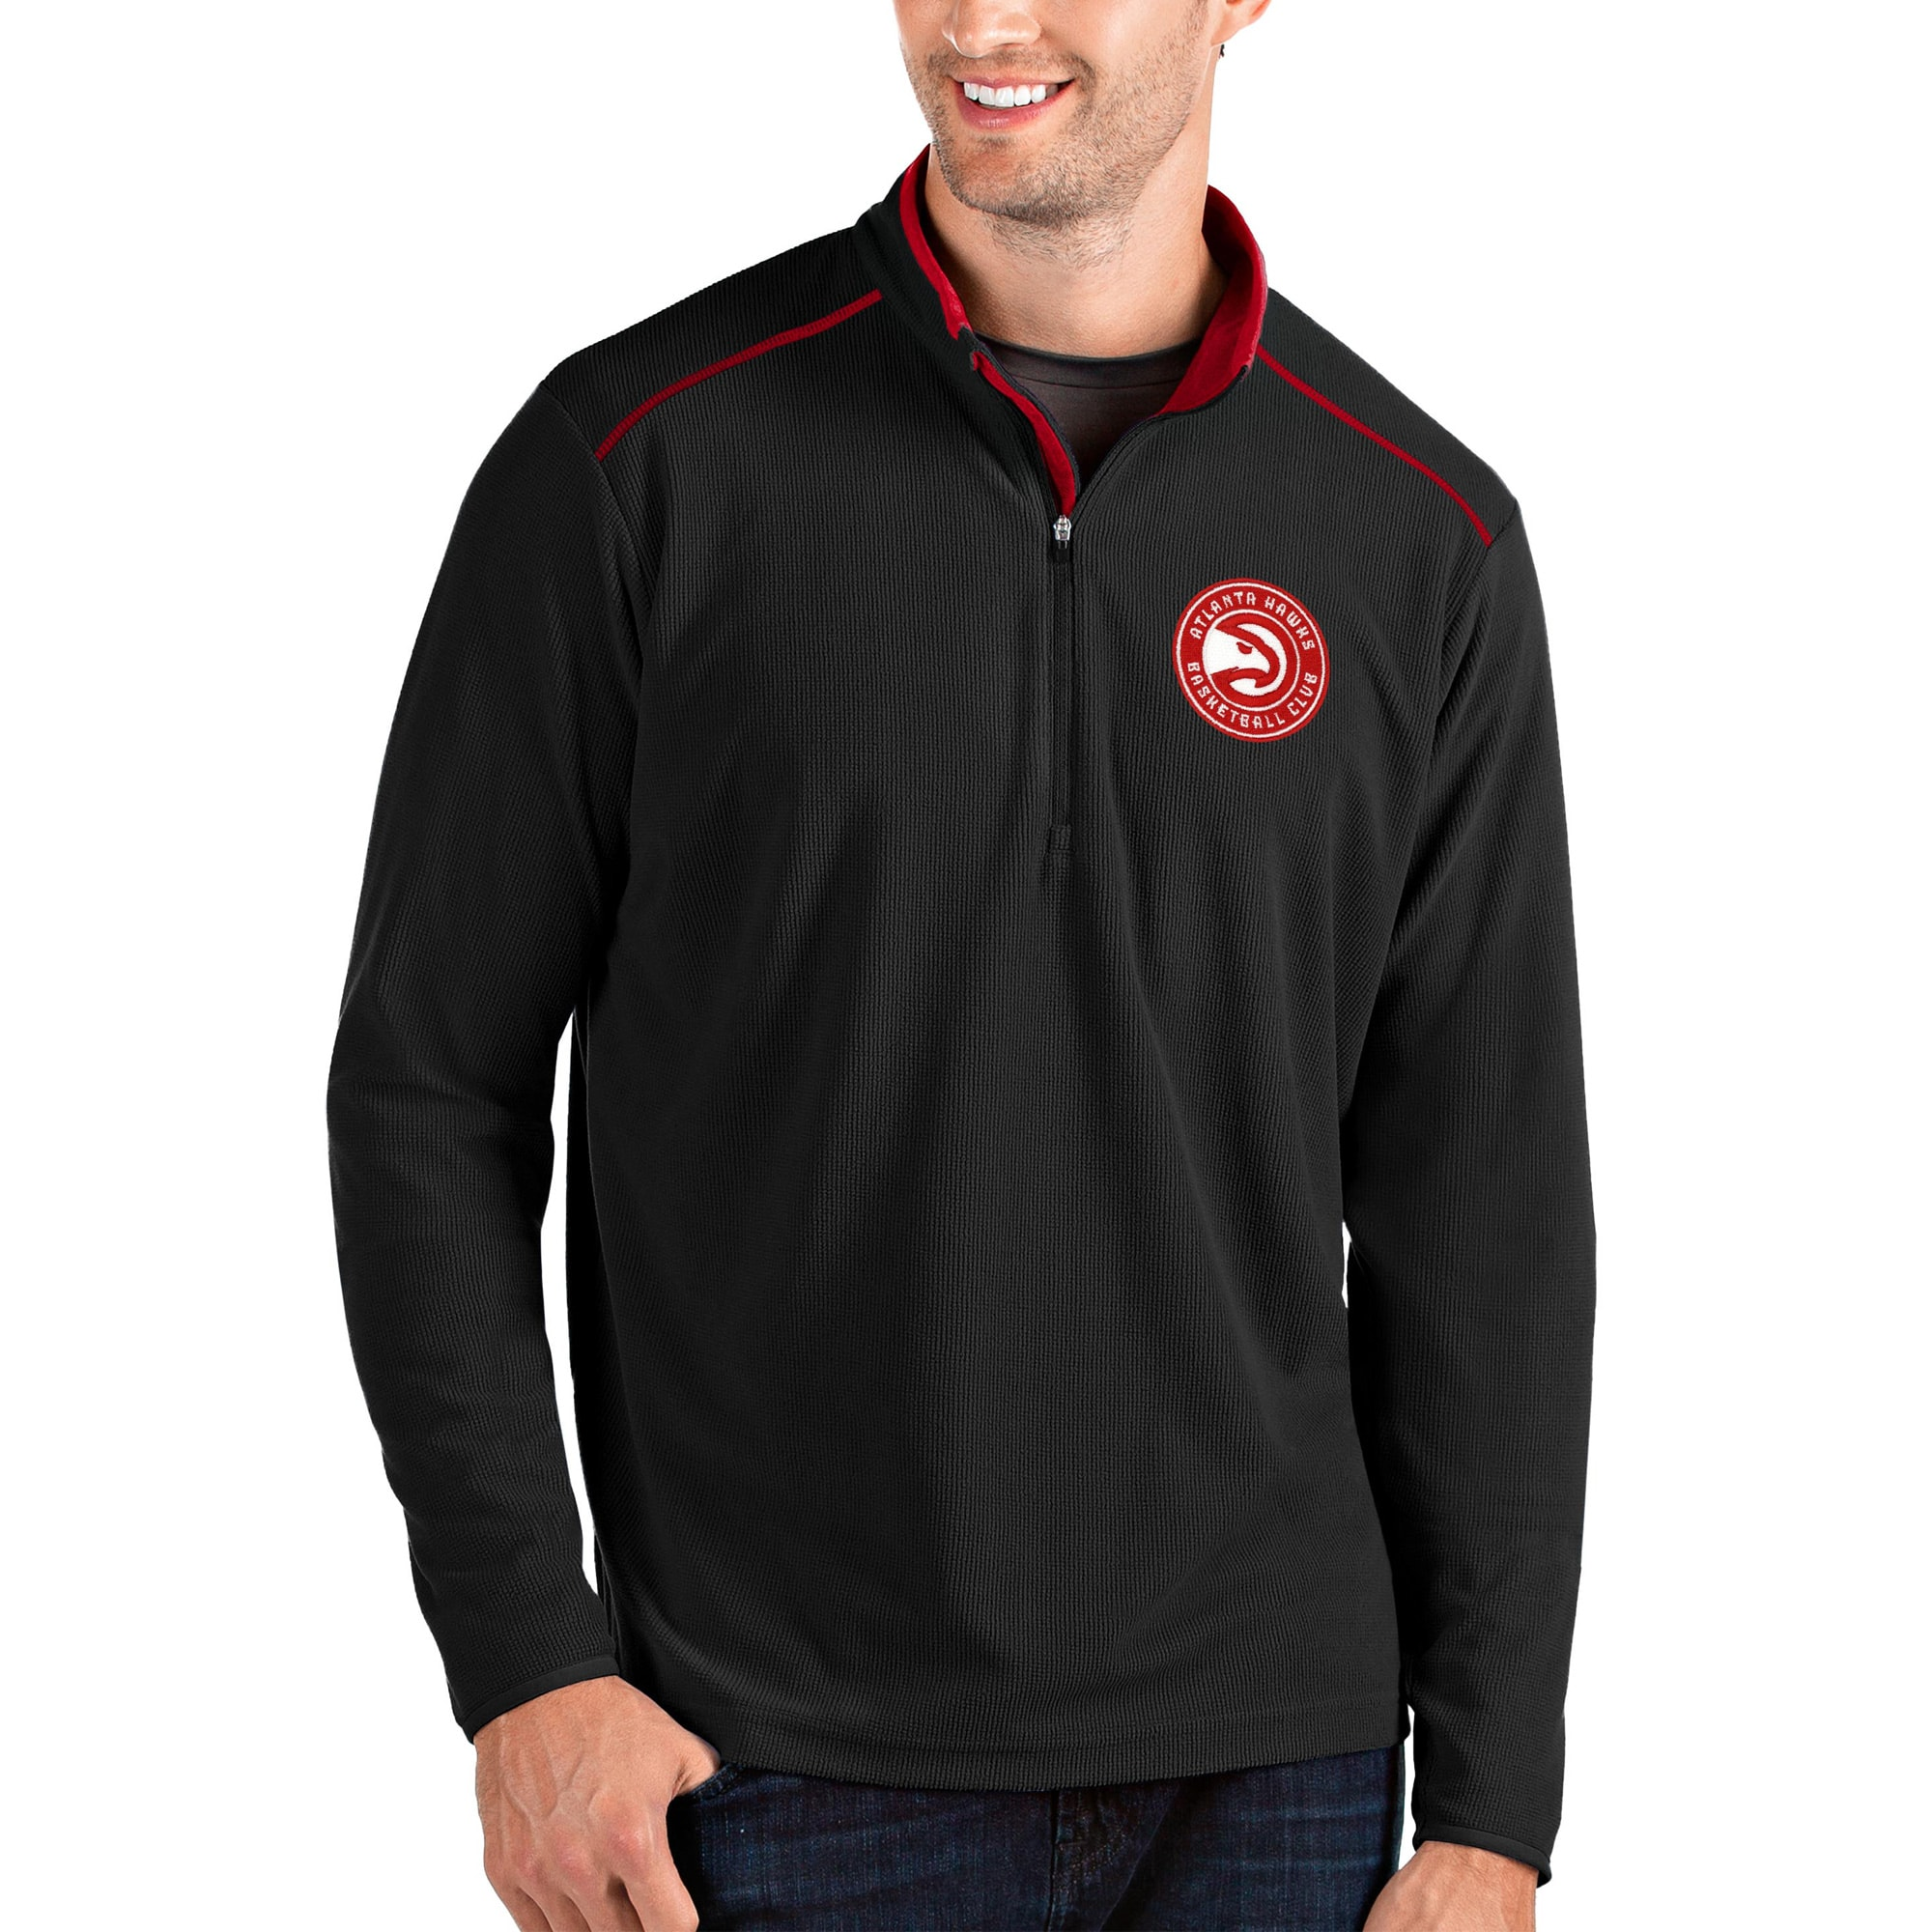 Atlanta Hawks Antigua Glacier Quarter-Zip Pullover Jacket - Black/Red